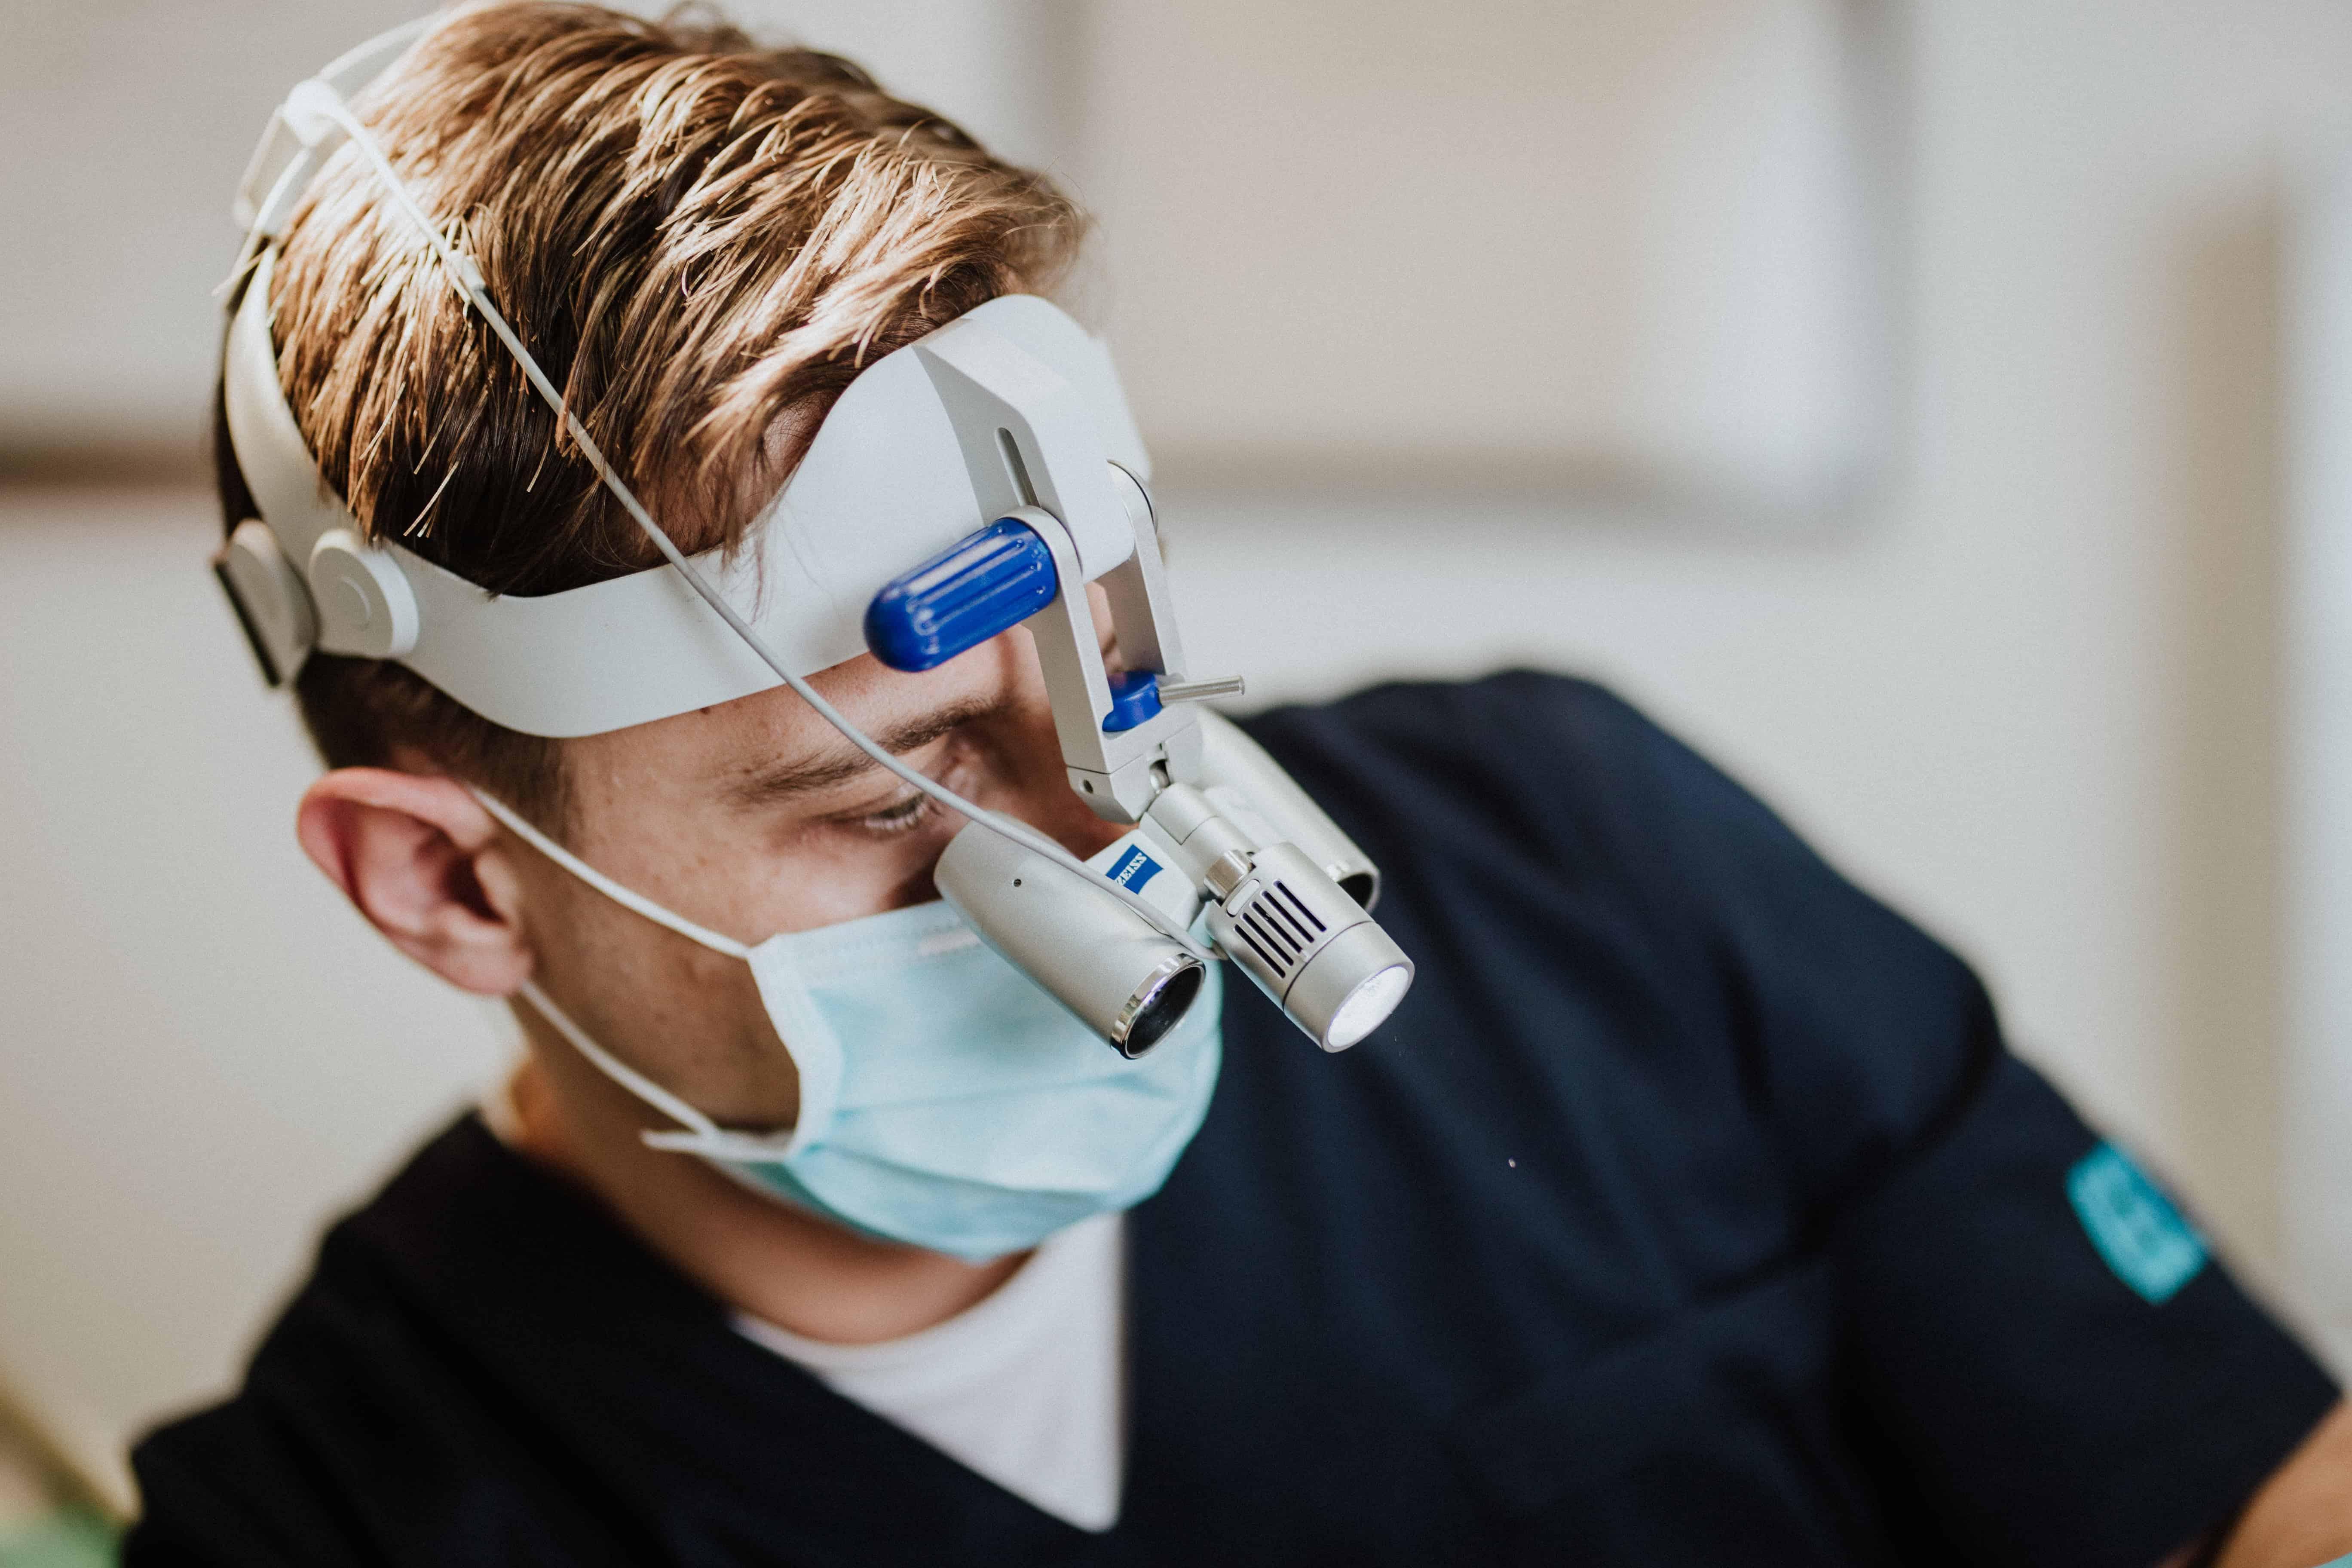 stomatoloska-poliklinika-breyer-sisak-implantati-all-on-4-cijena